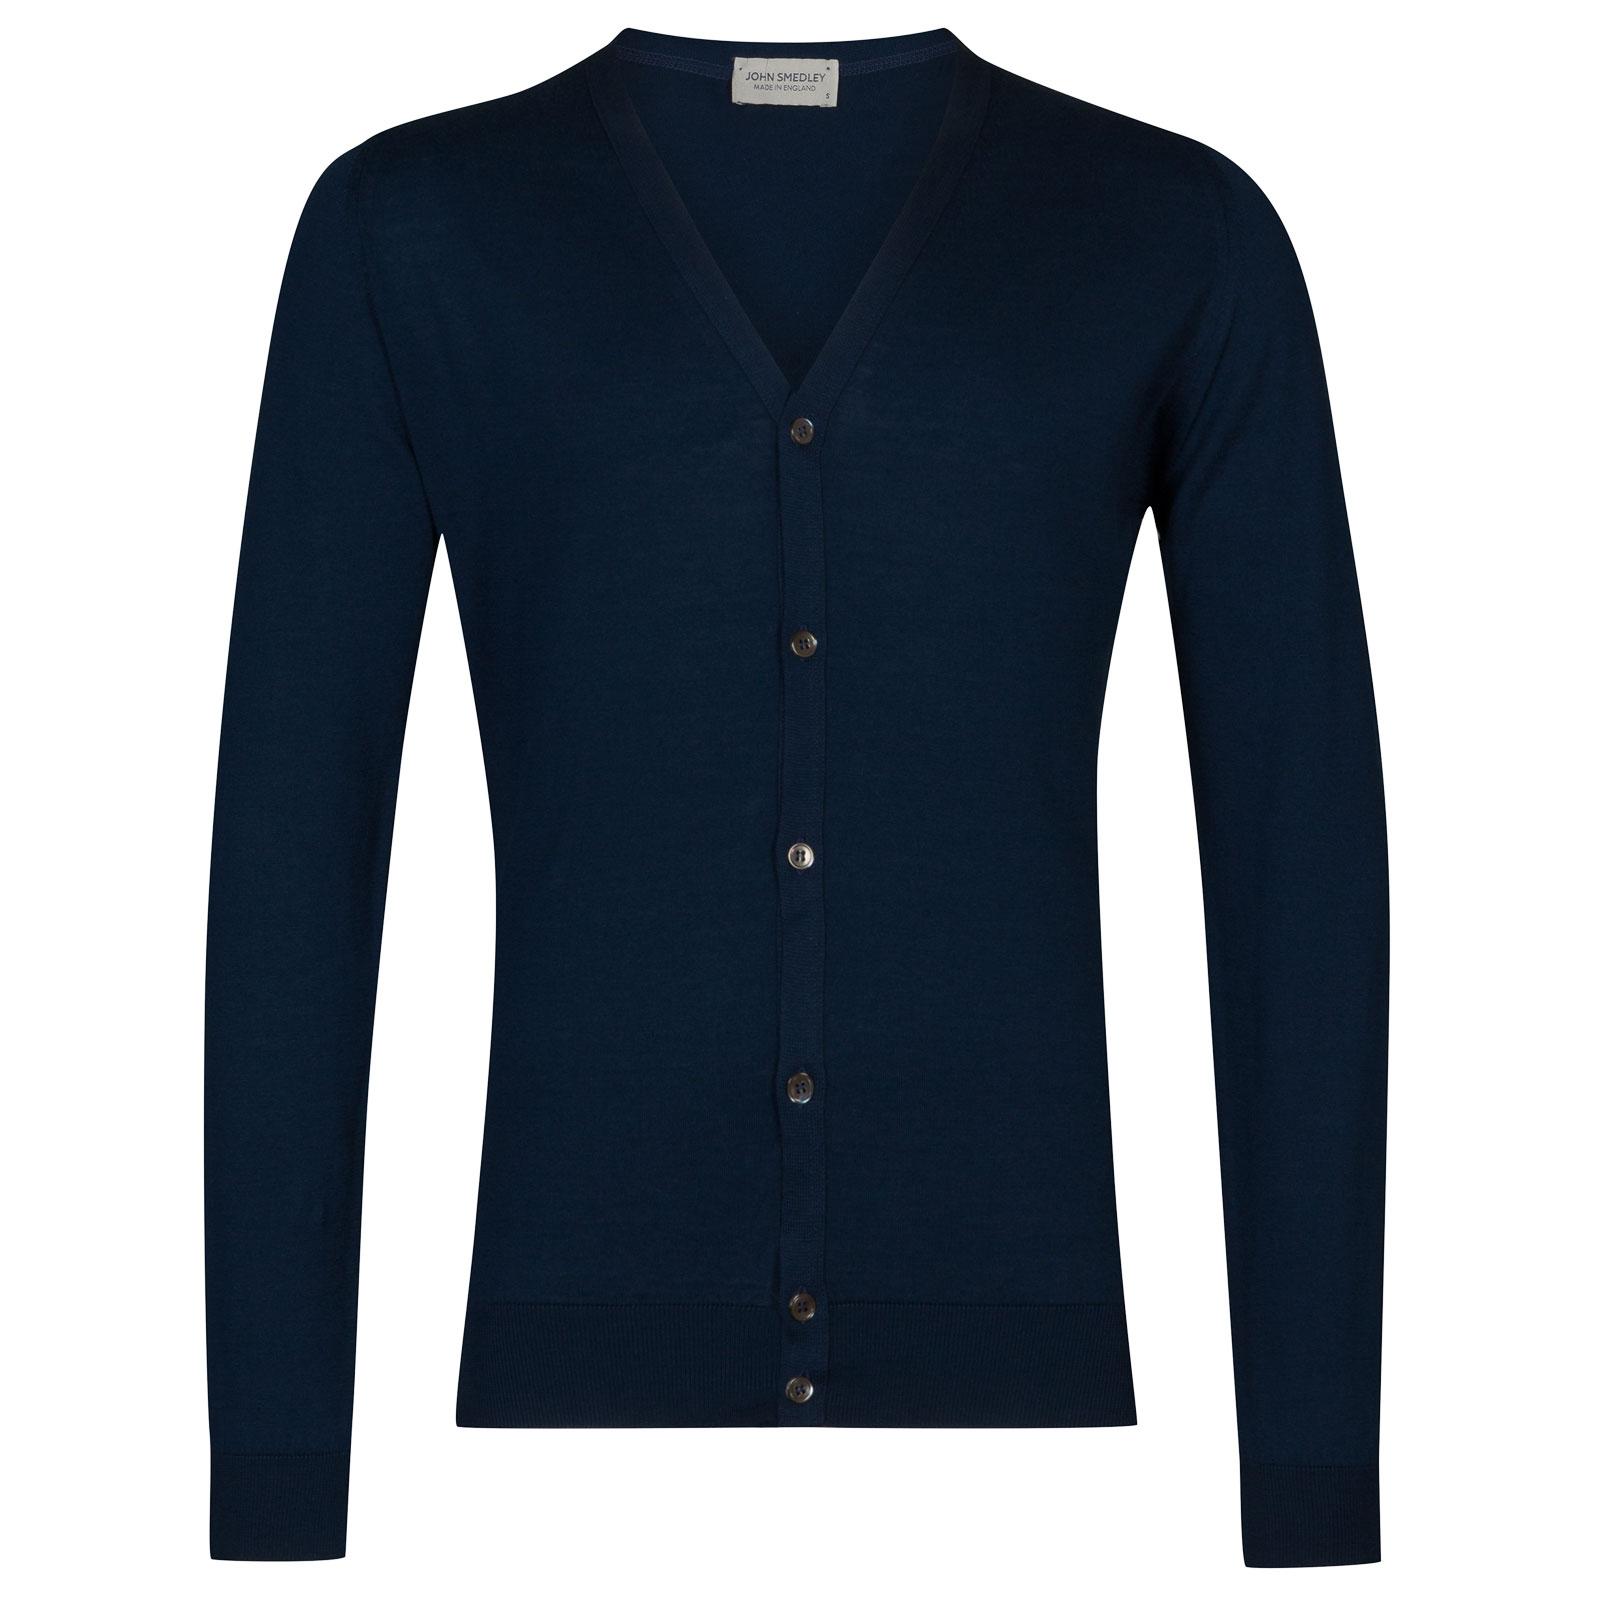 John Smedley whitchurch Sea Island Cotton Cardigan in Indigo-XL